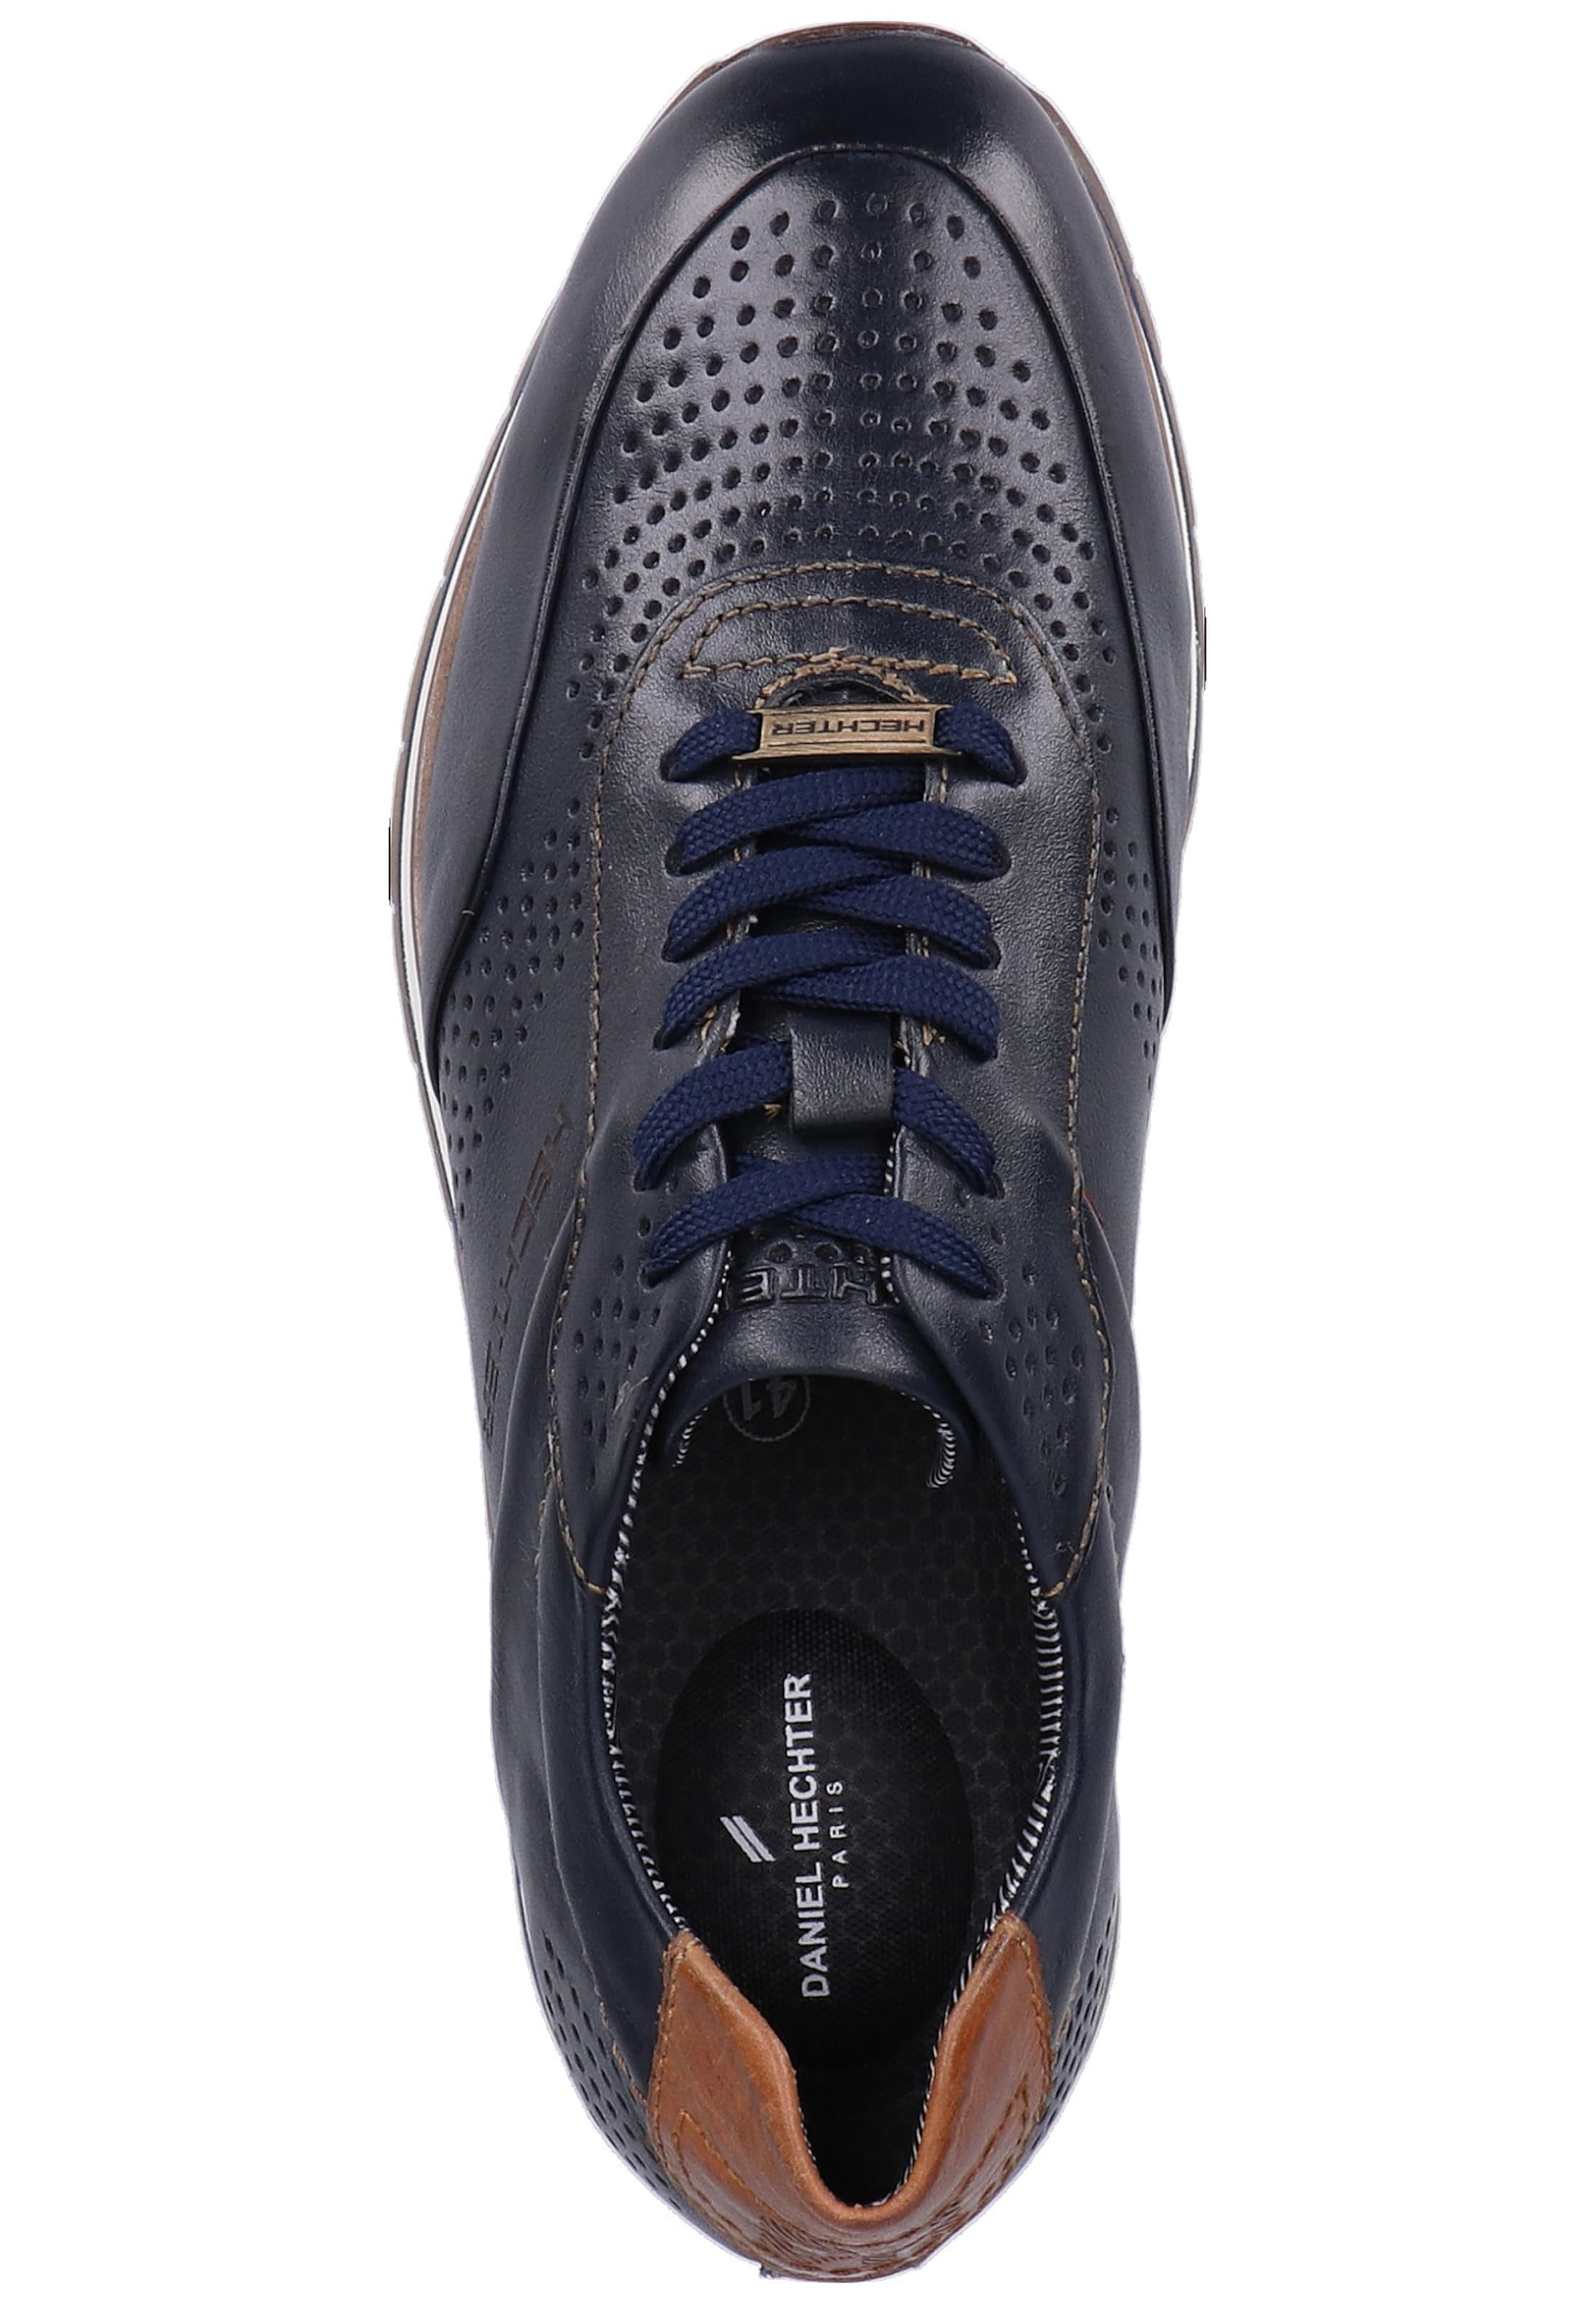 'garlan Sneaker In Hechter Daniel Evo' NavyHellbraun 0Nmw8nv